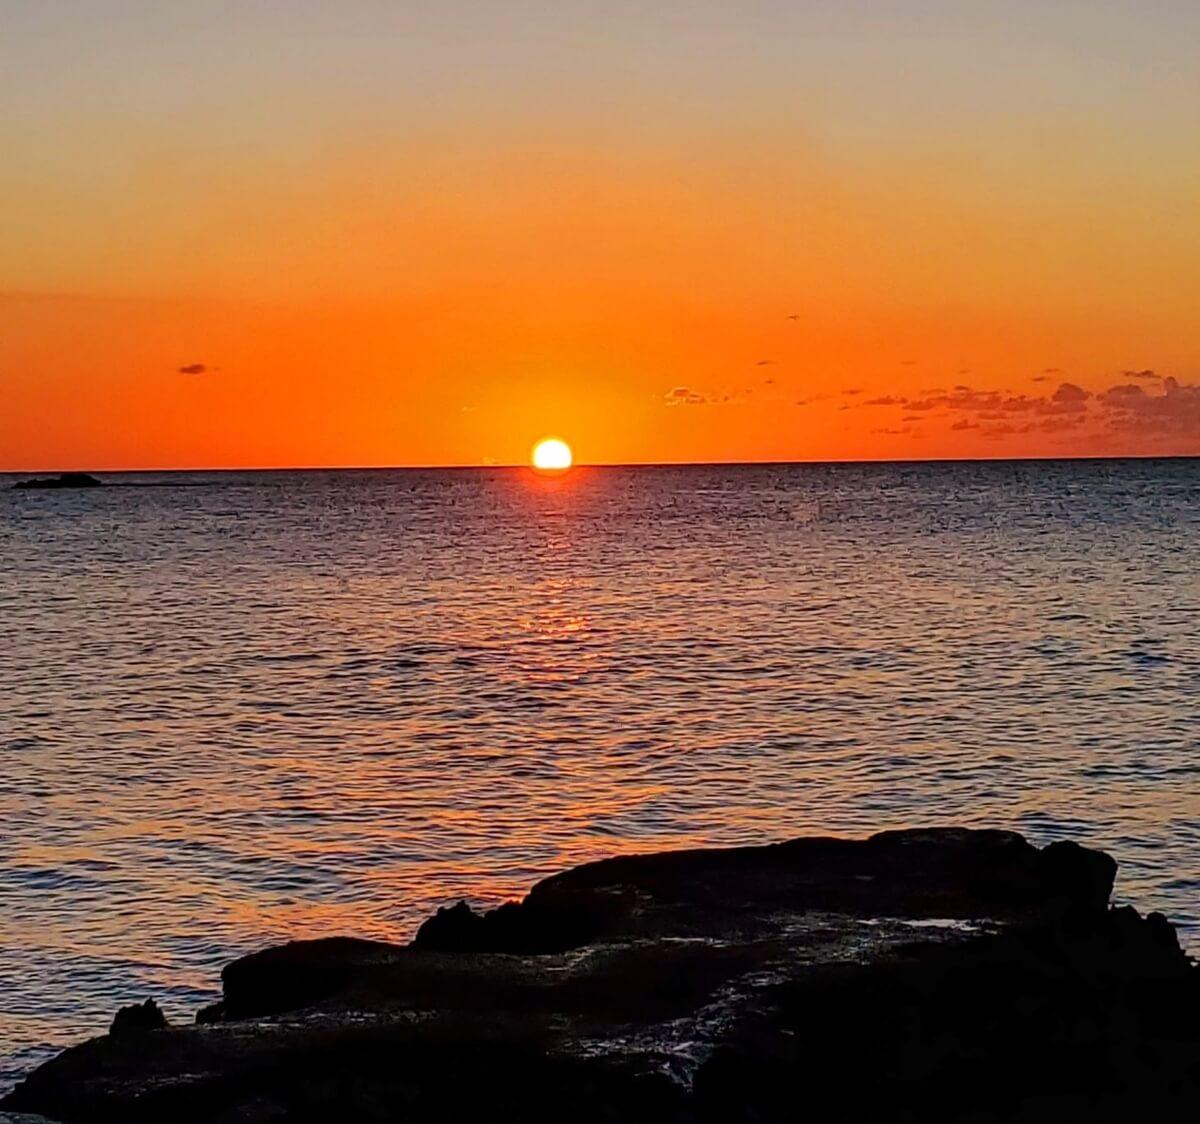 An orange Jamaican sunset over the ocean, part of Jamaica's one-love treasures